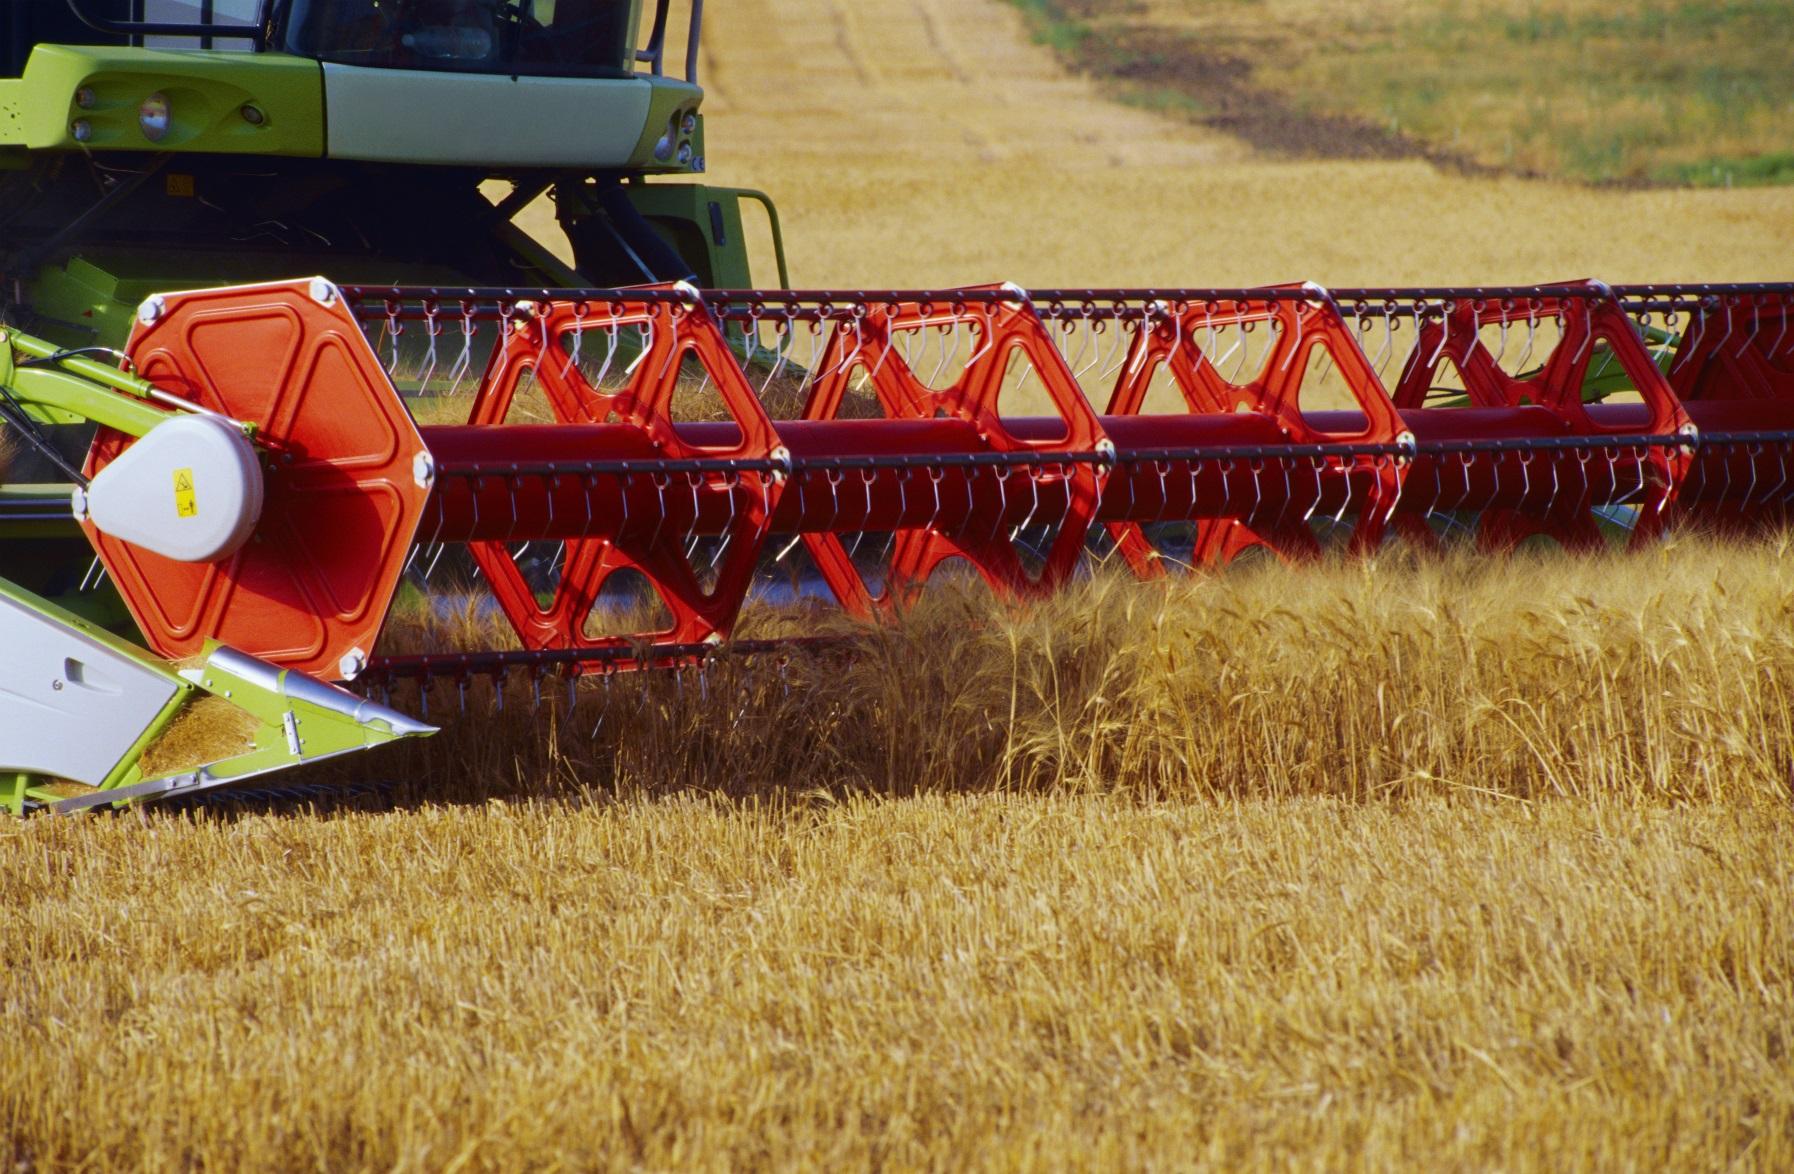 Ekspor gandum Rusia 2016 berjumlah sekitar 25 juta ton.